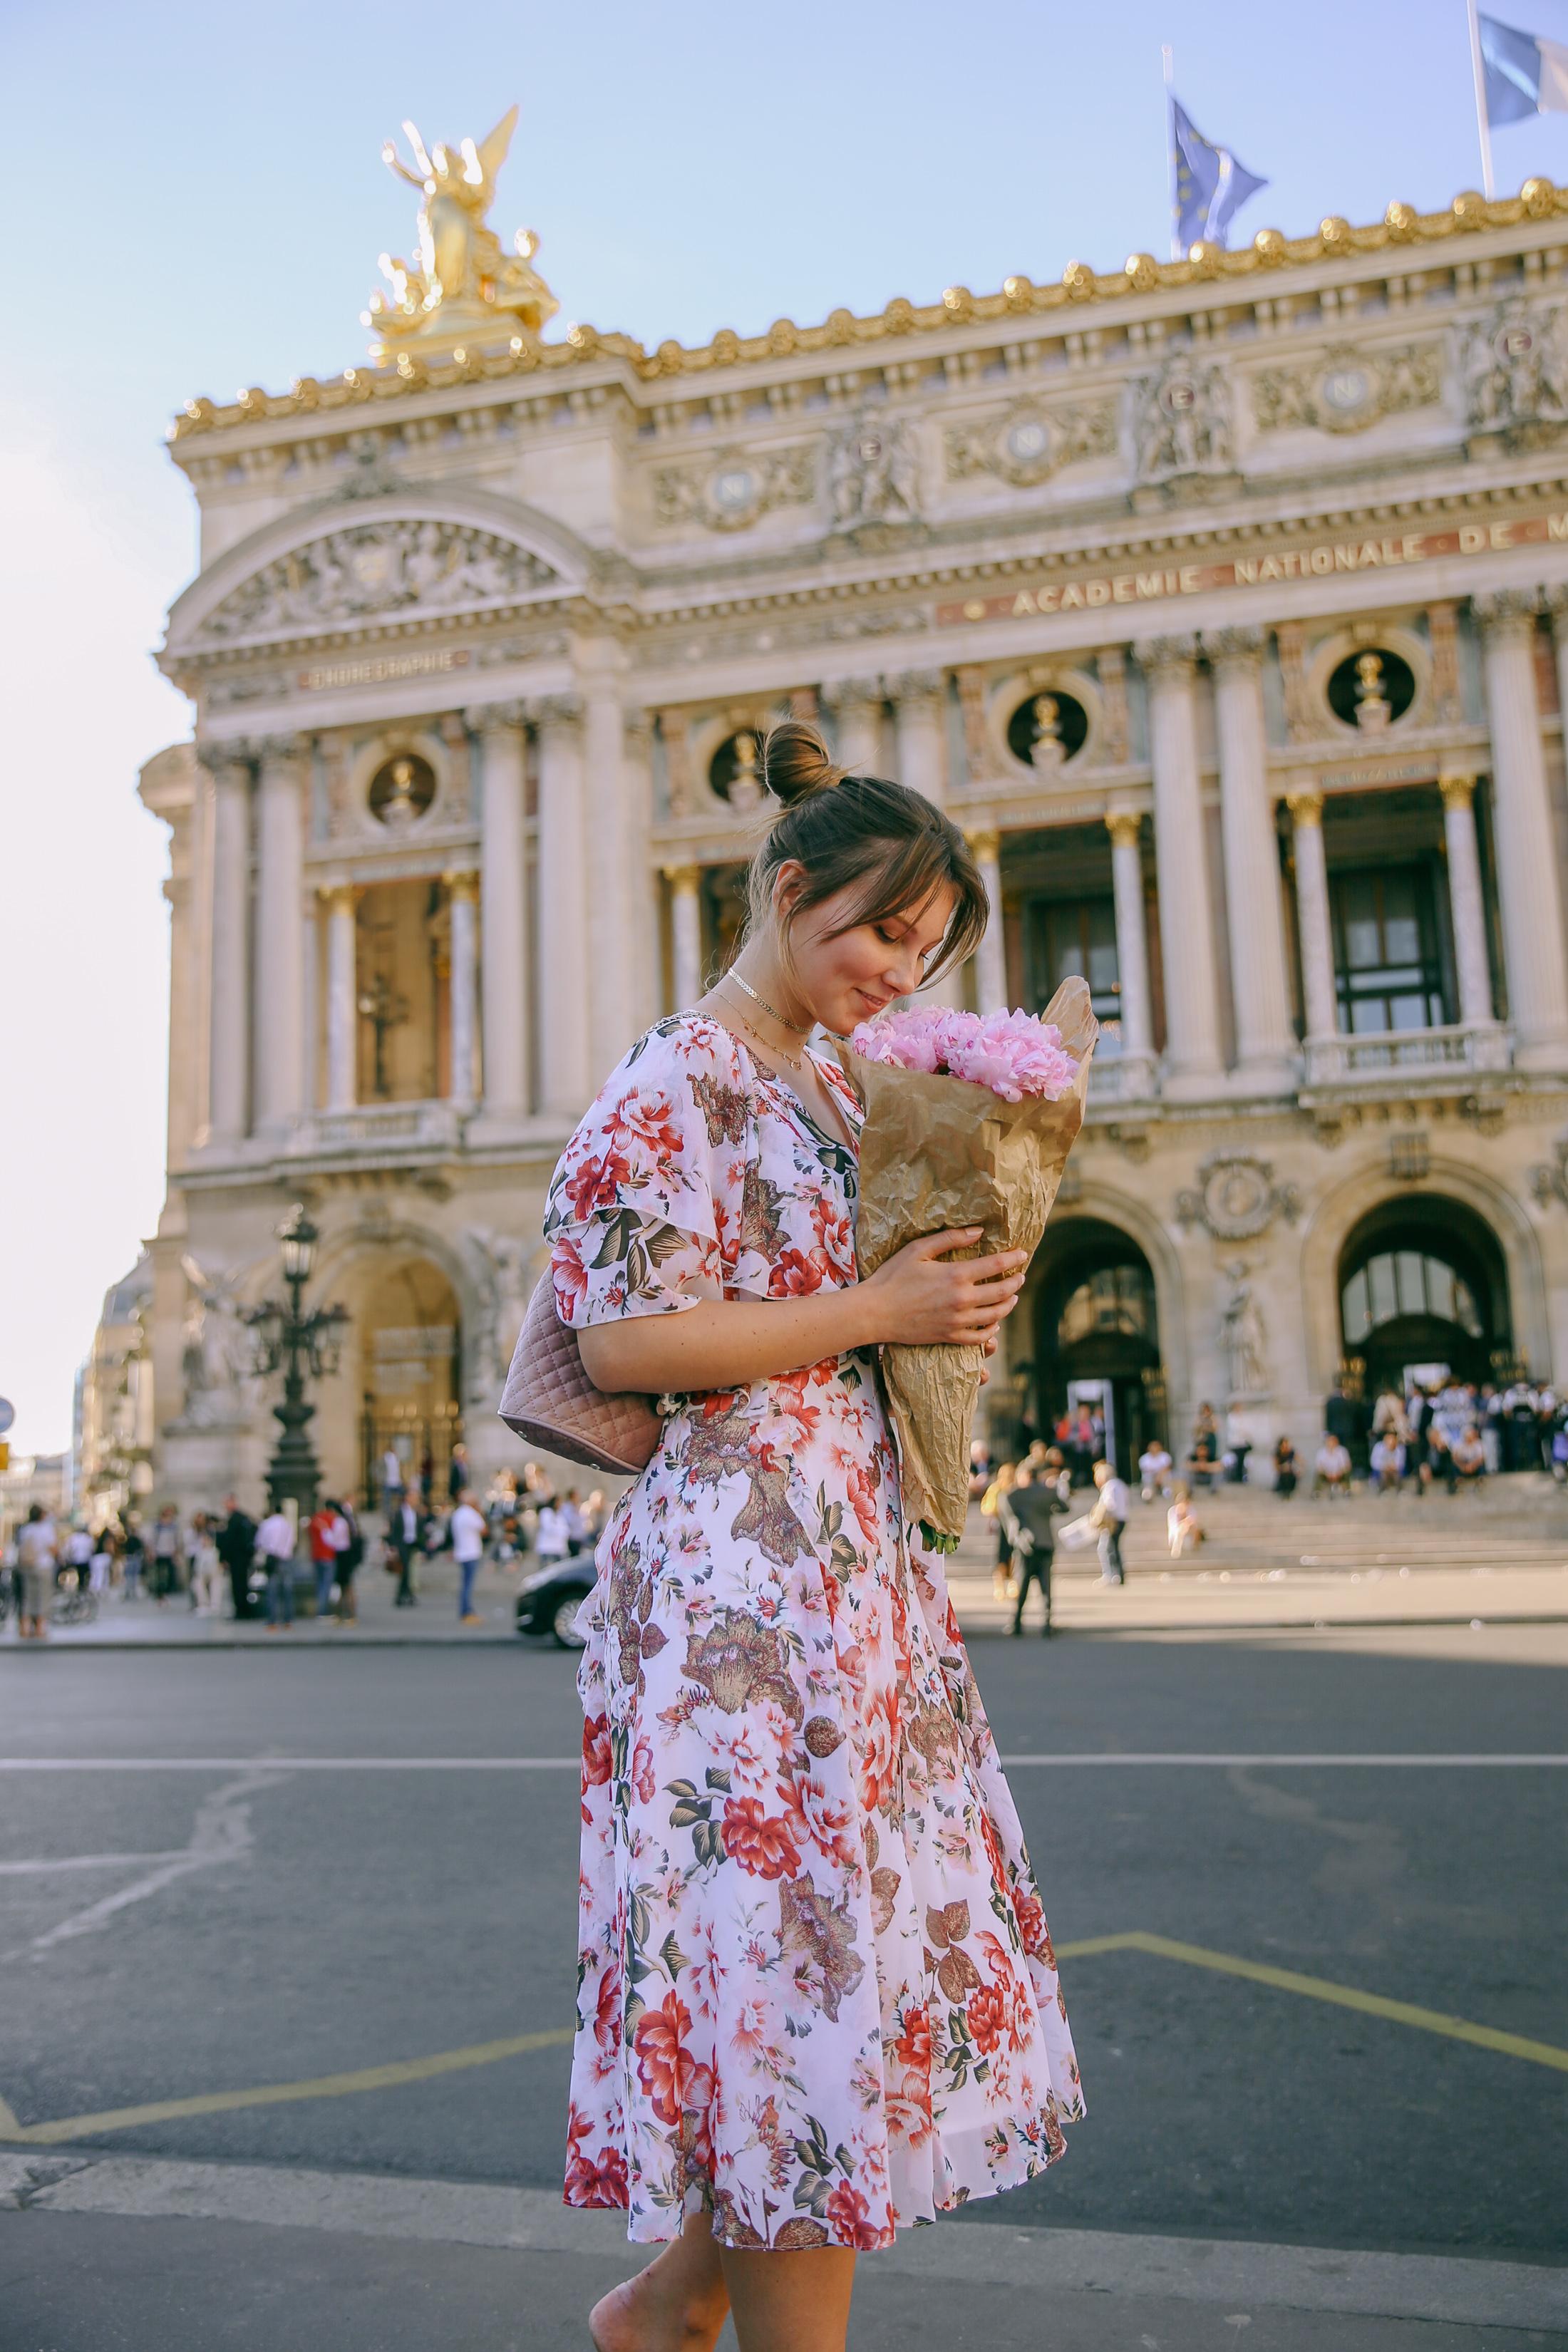 paris-peonies-girl